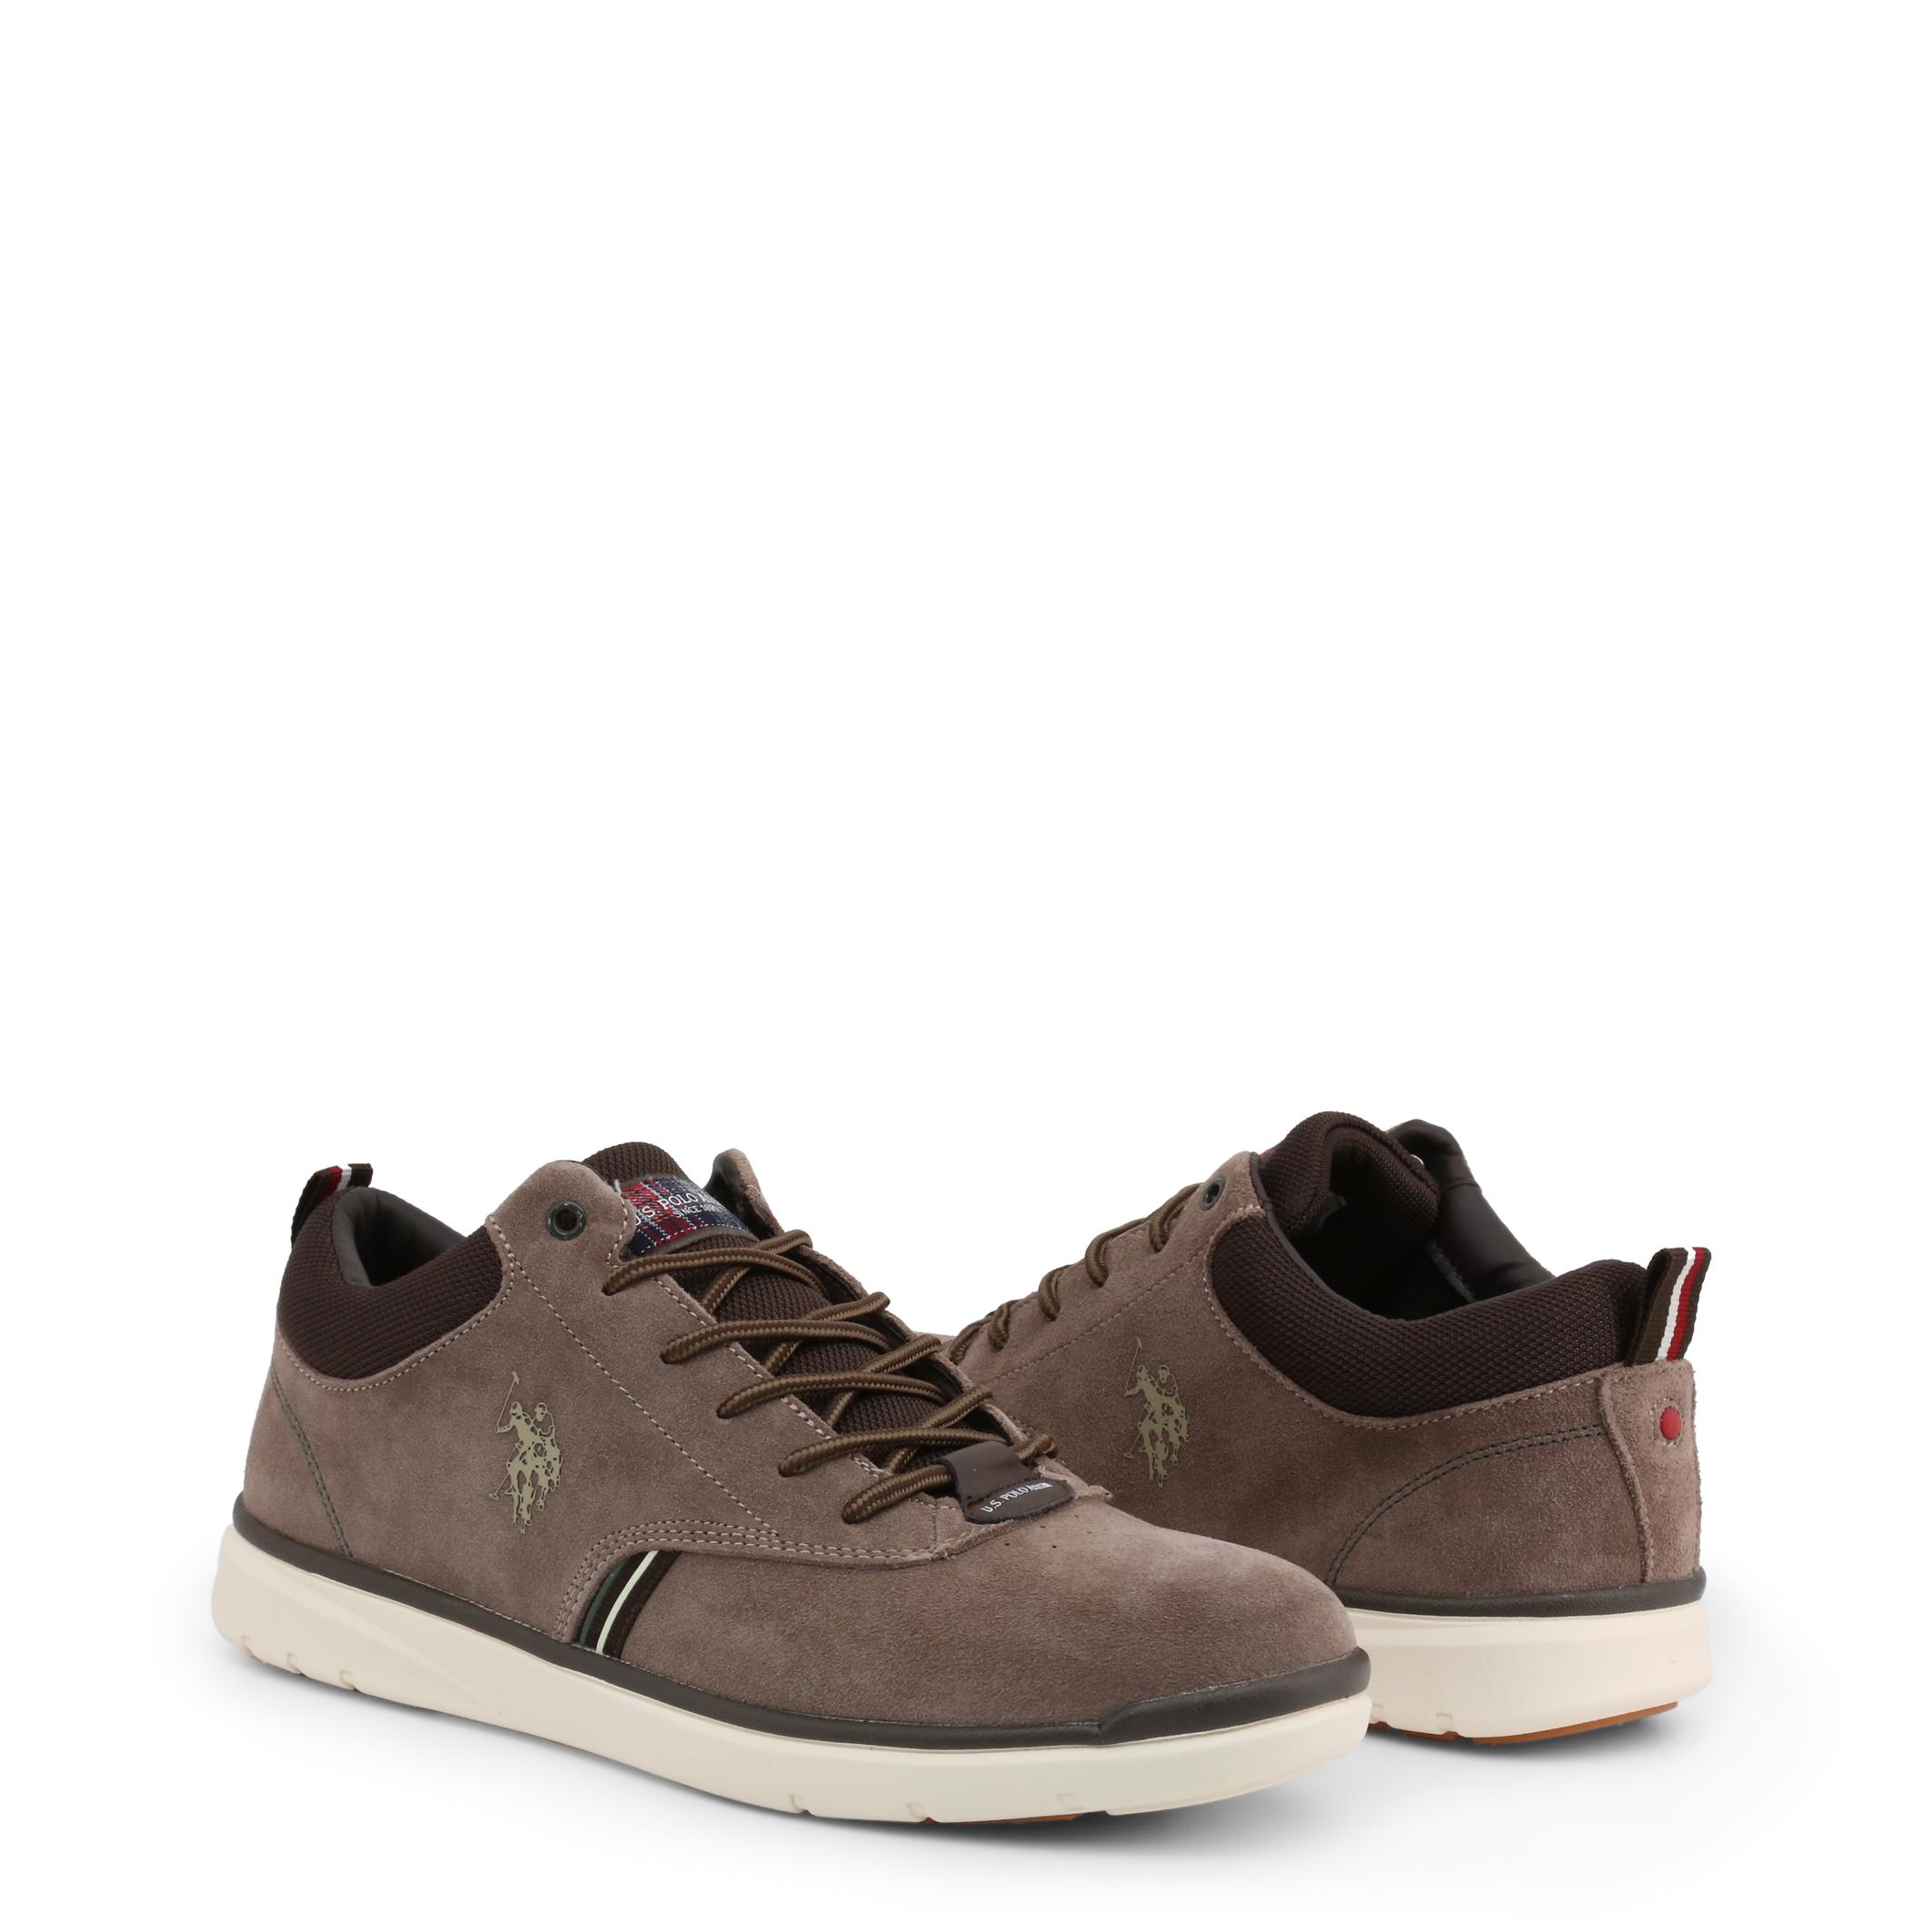 Chaussures de ville  U.S. Polo Assn. YGOR4125W9_S1_MUD brown